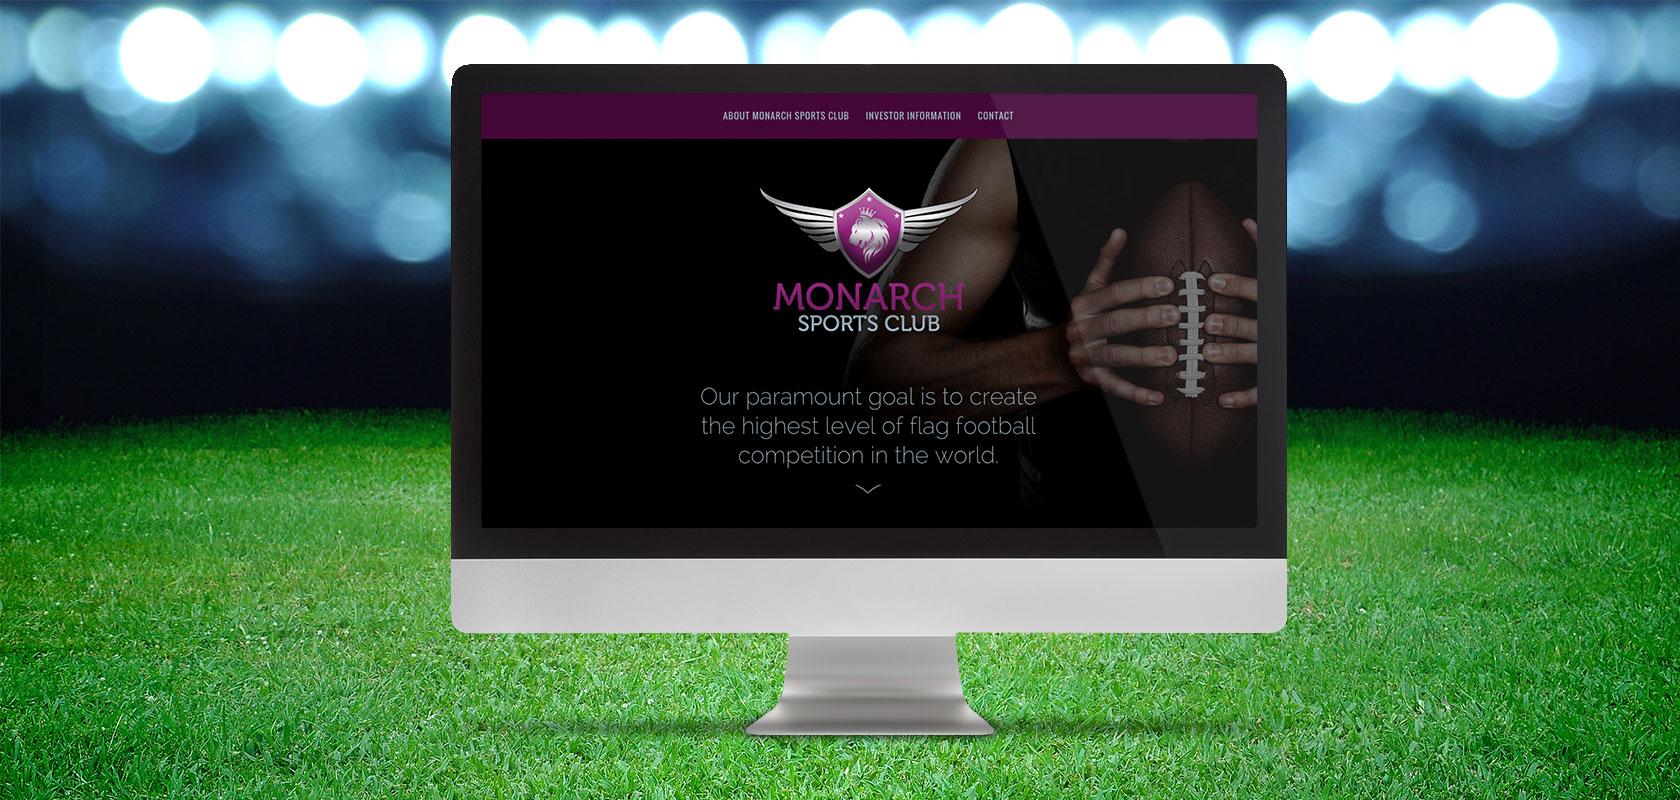 monarch-website